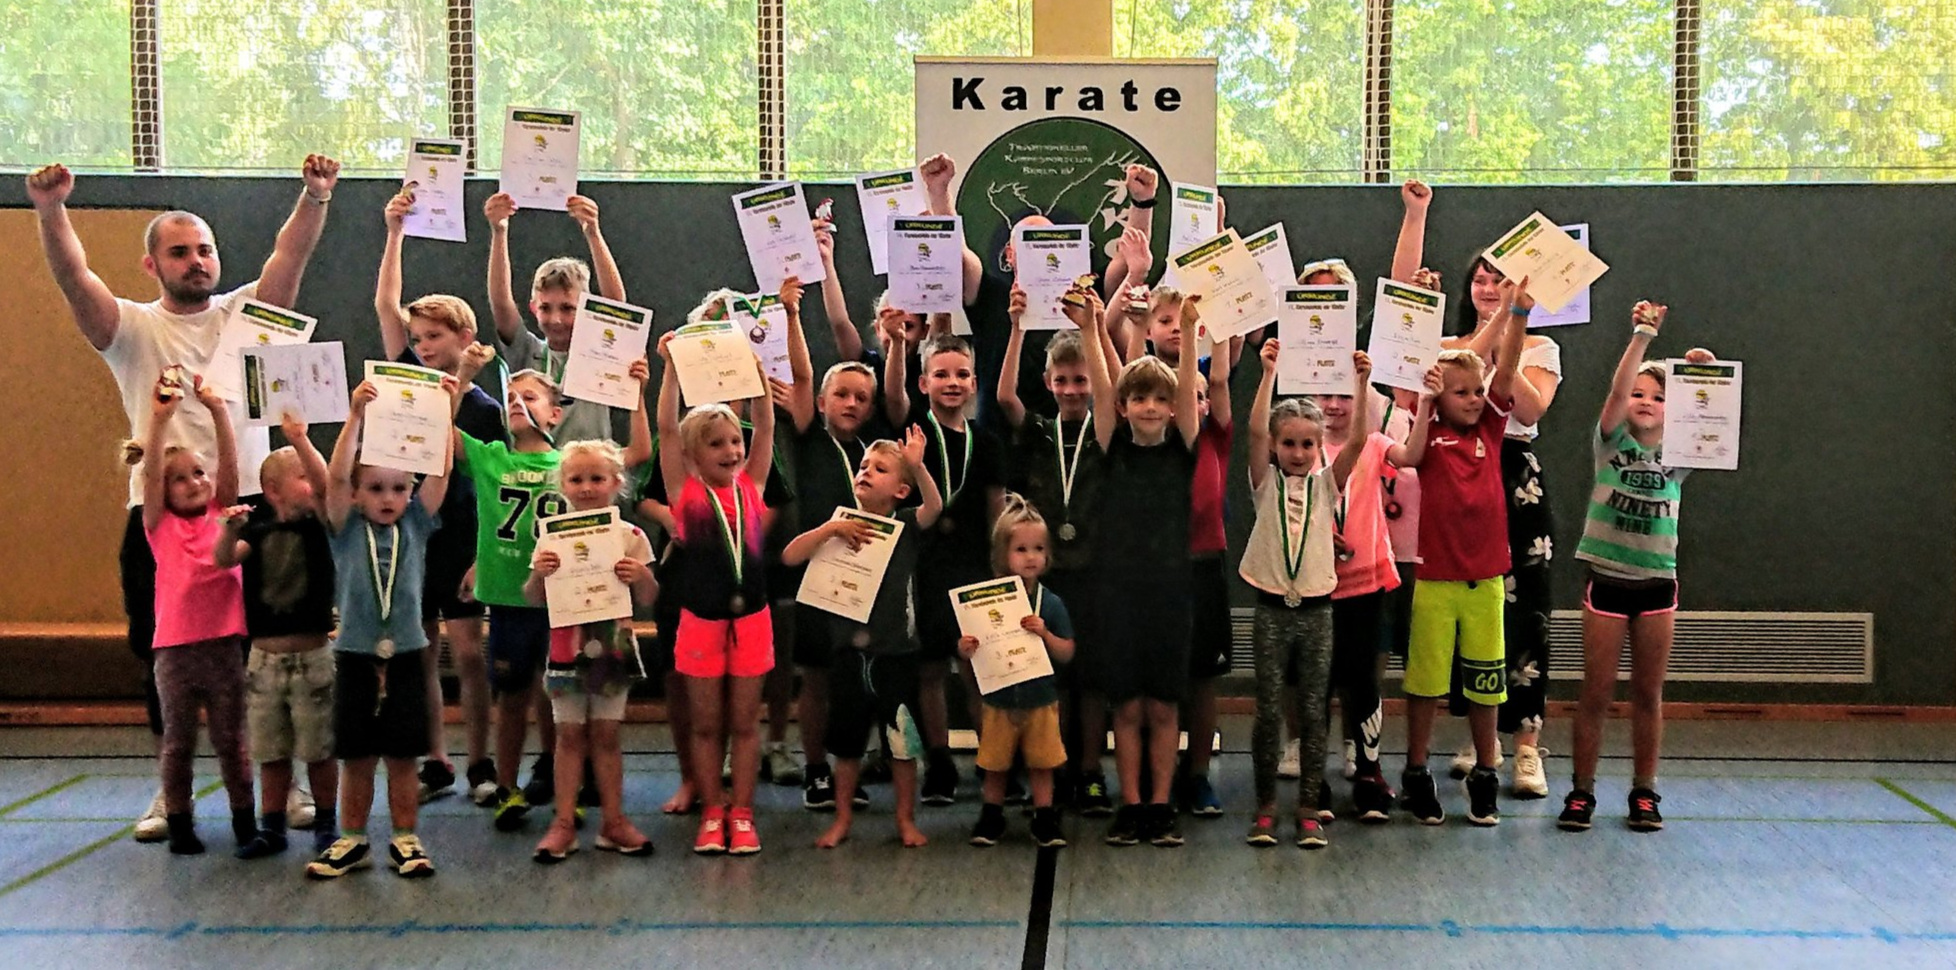 So sehen Sieger aus! 10. Karate-Spiele Berlin Müggelheim; Quelle: TKCB e.V.